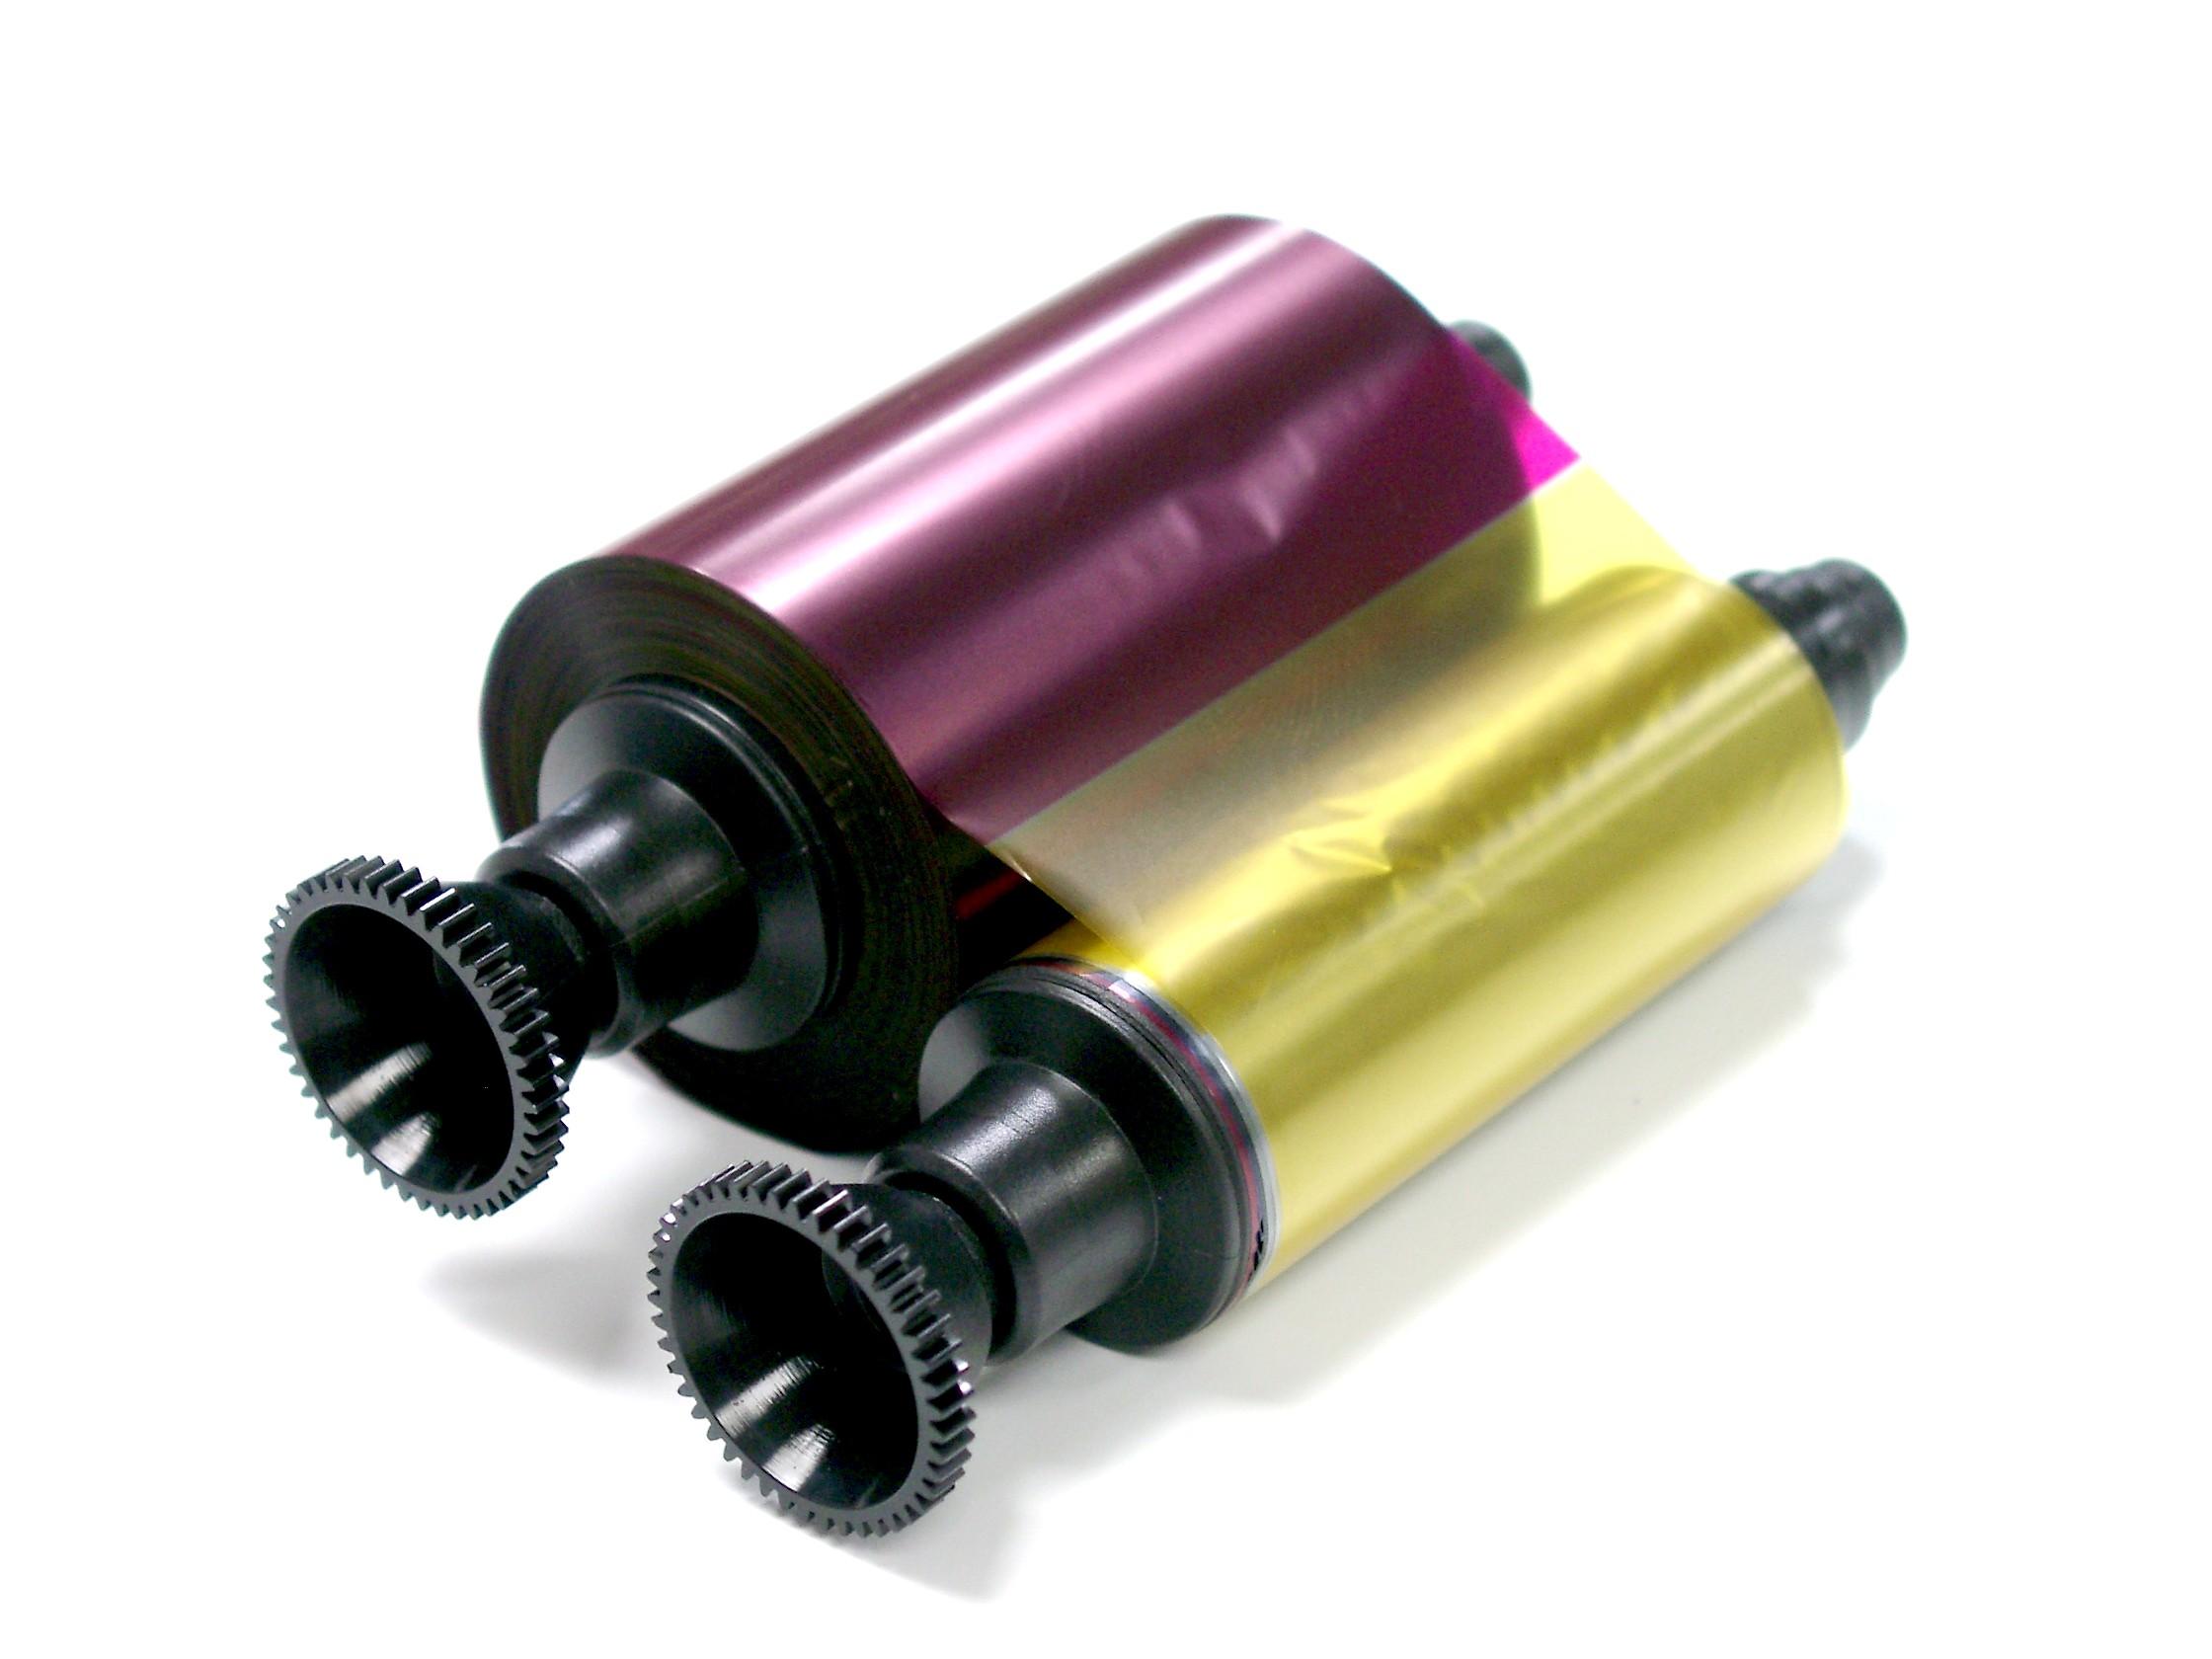 R3011 Full Color Strip YMCKO Compatible for Evolis Pebble Dualys /& Securion